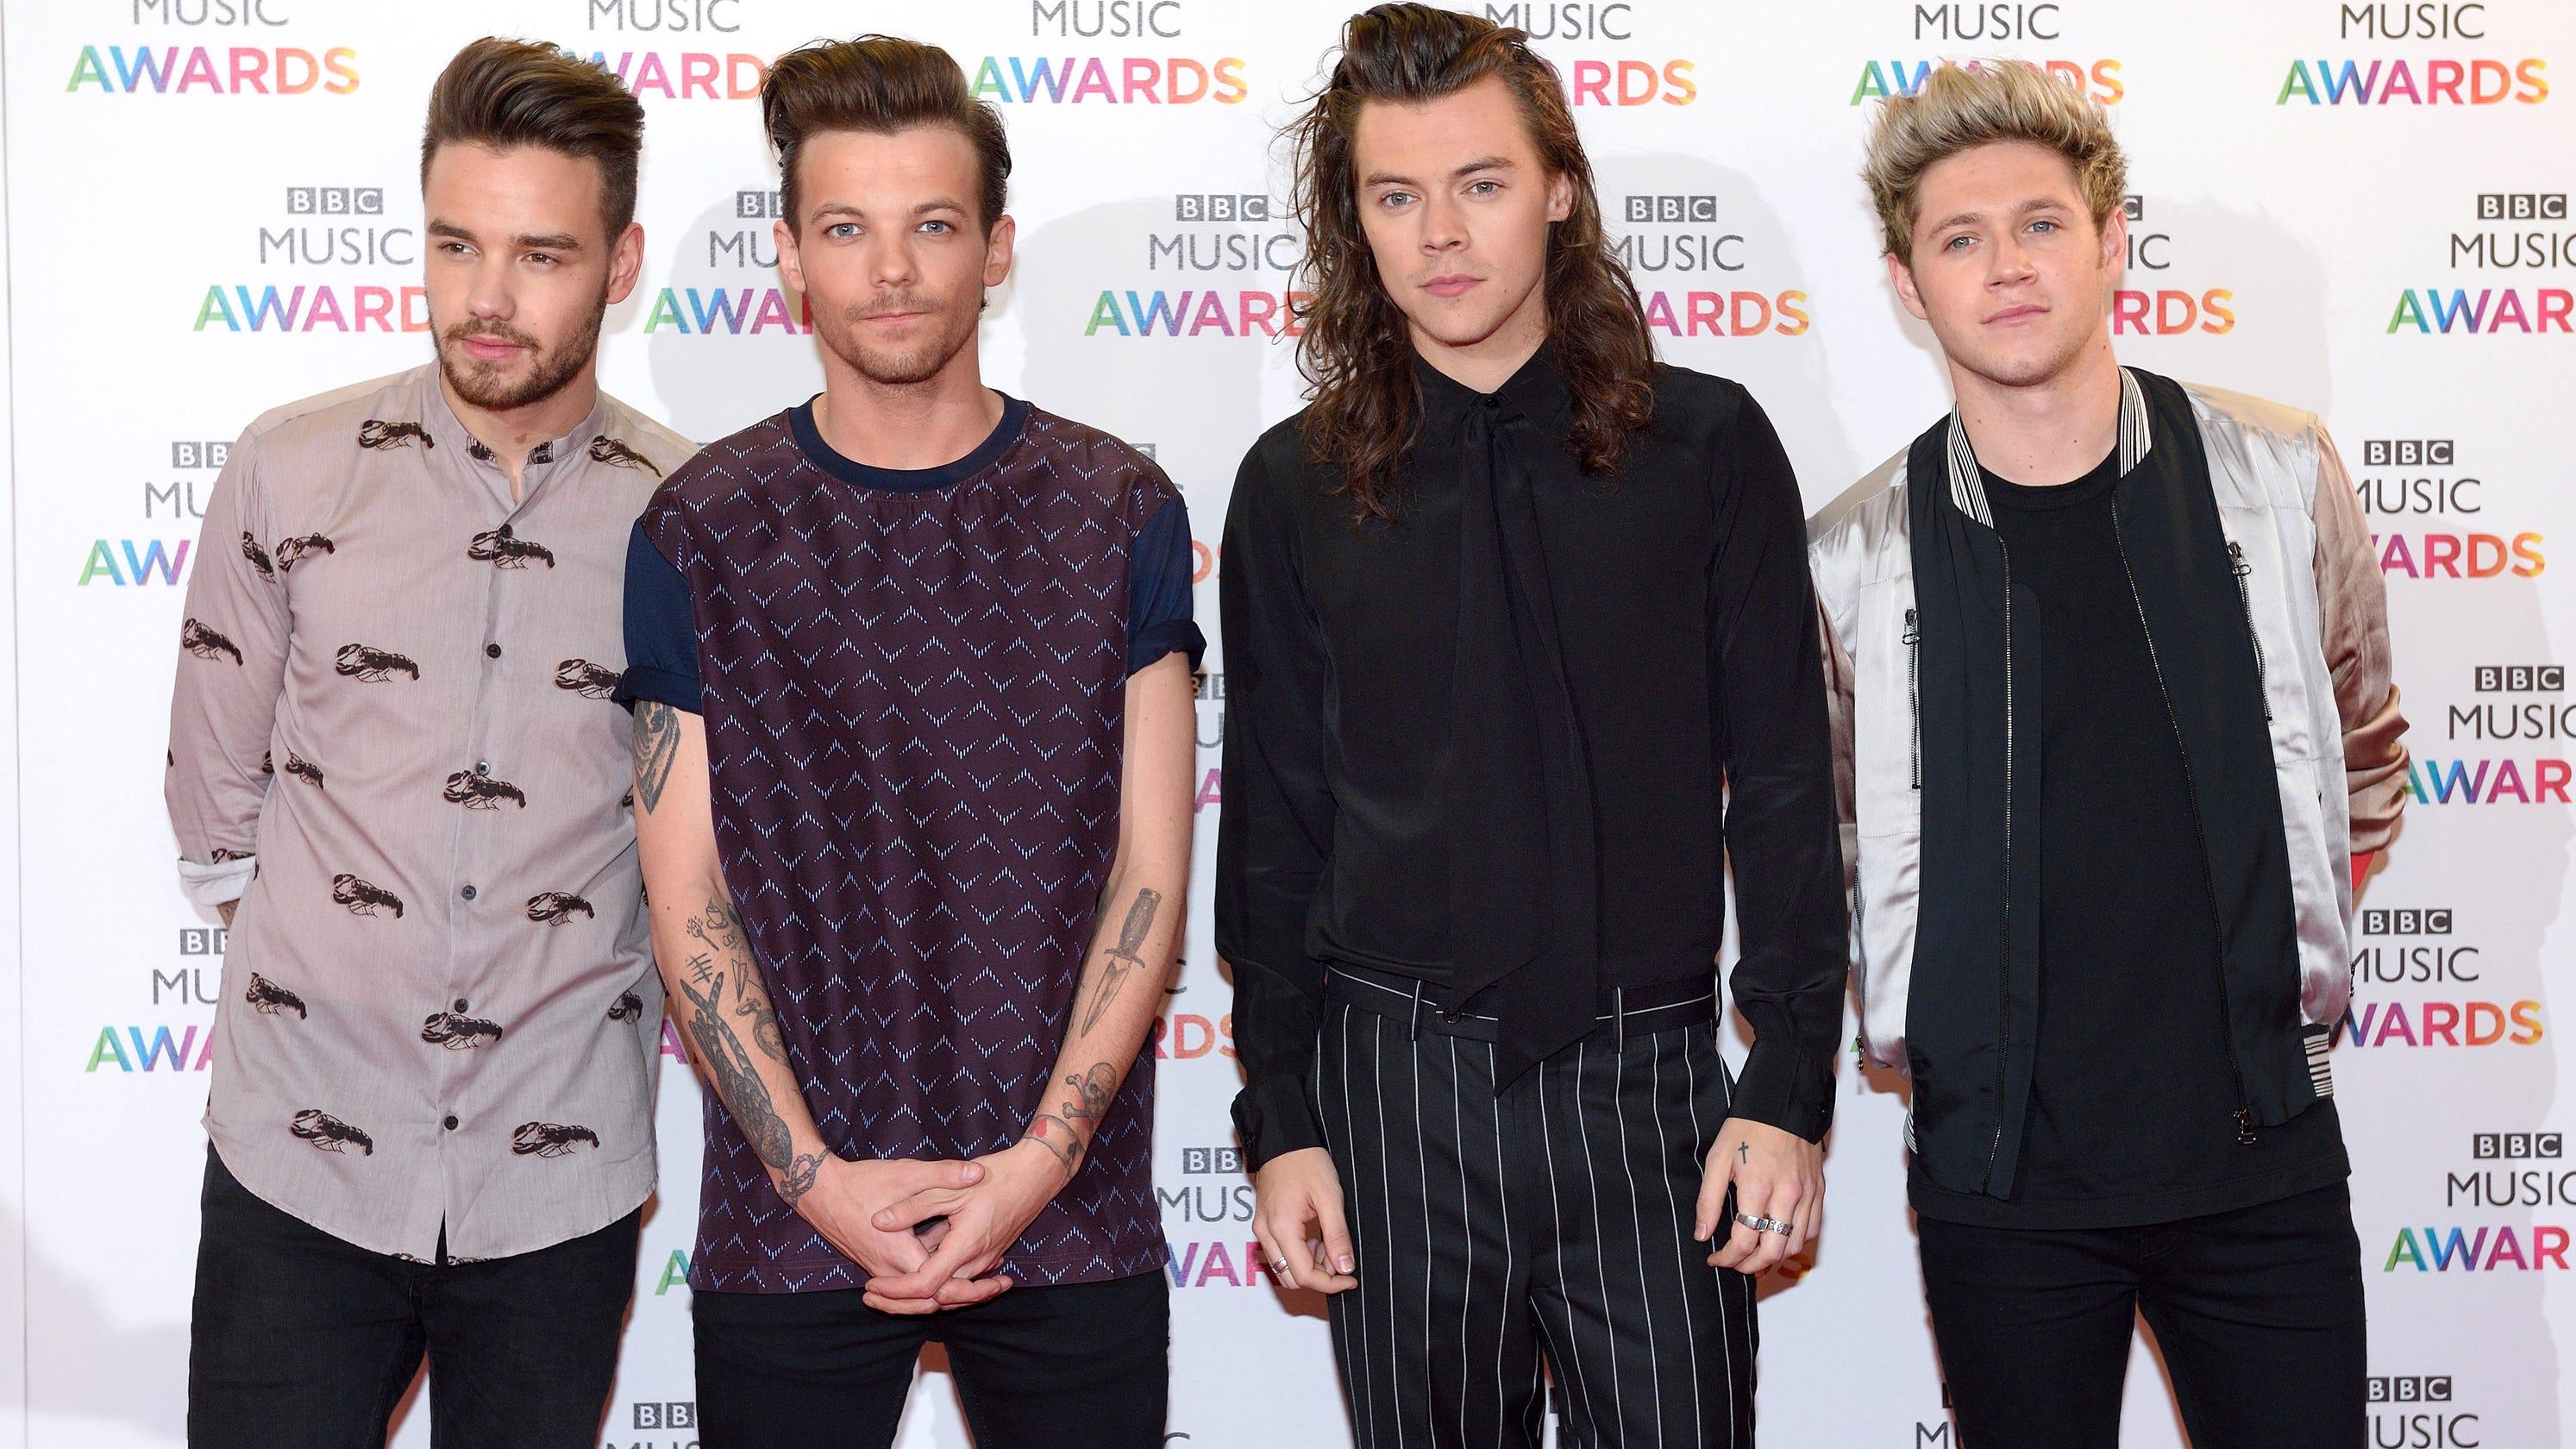 Euphoria' enrages One Direction fans